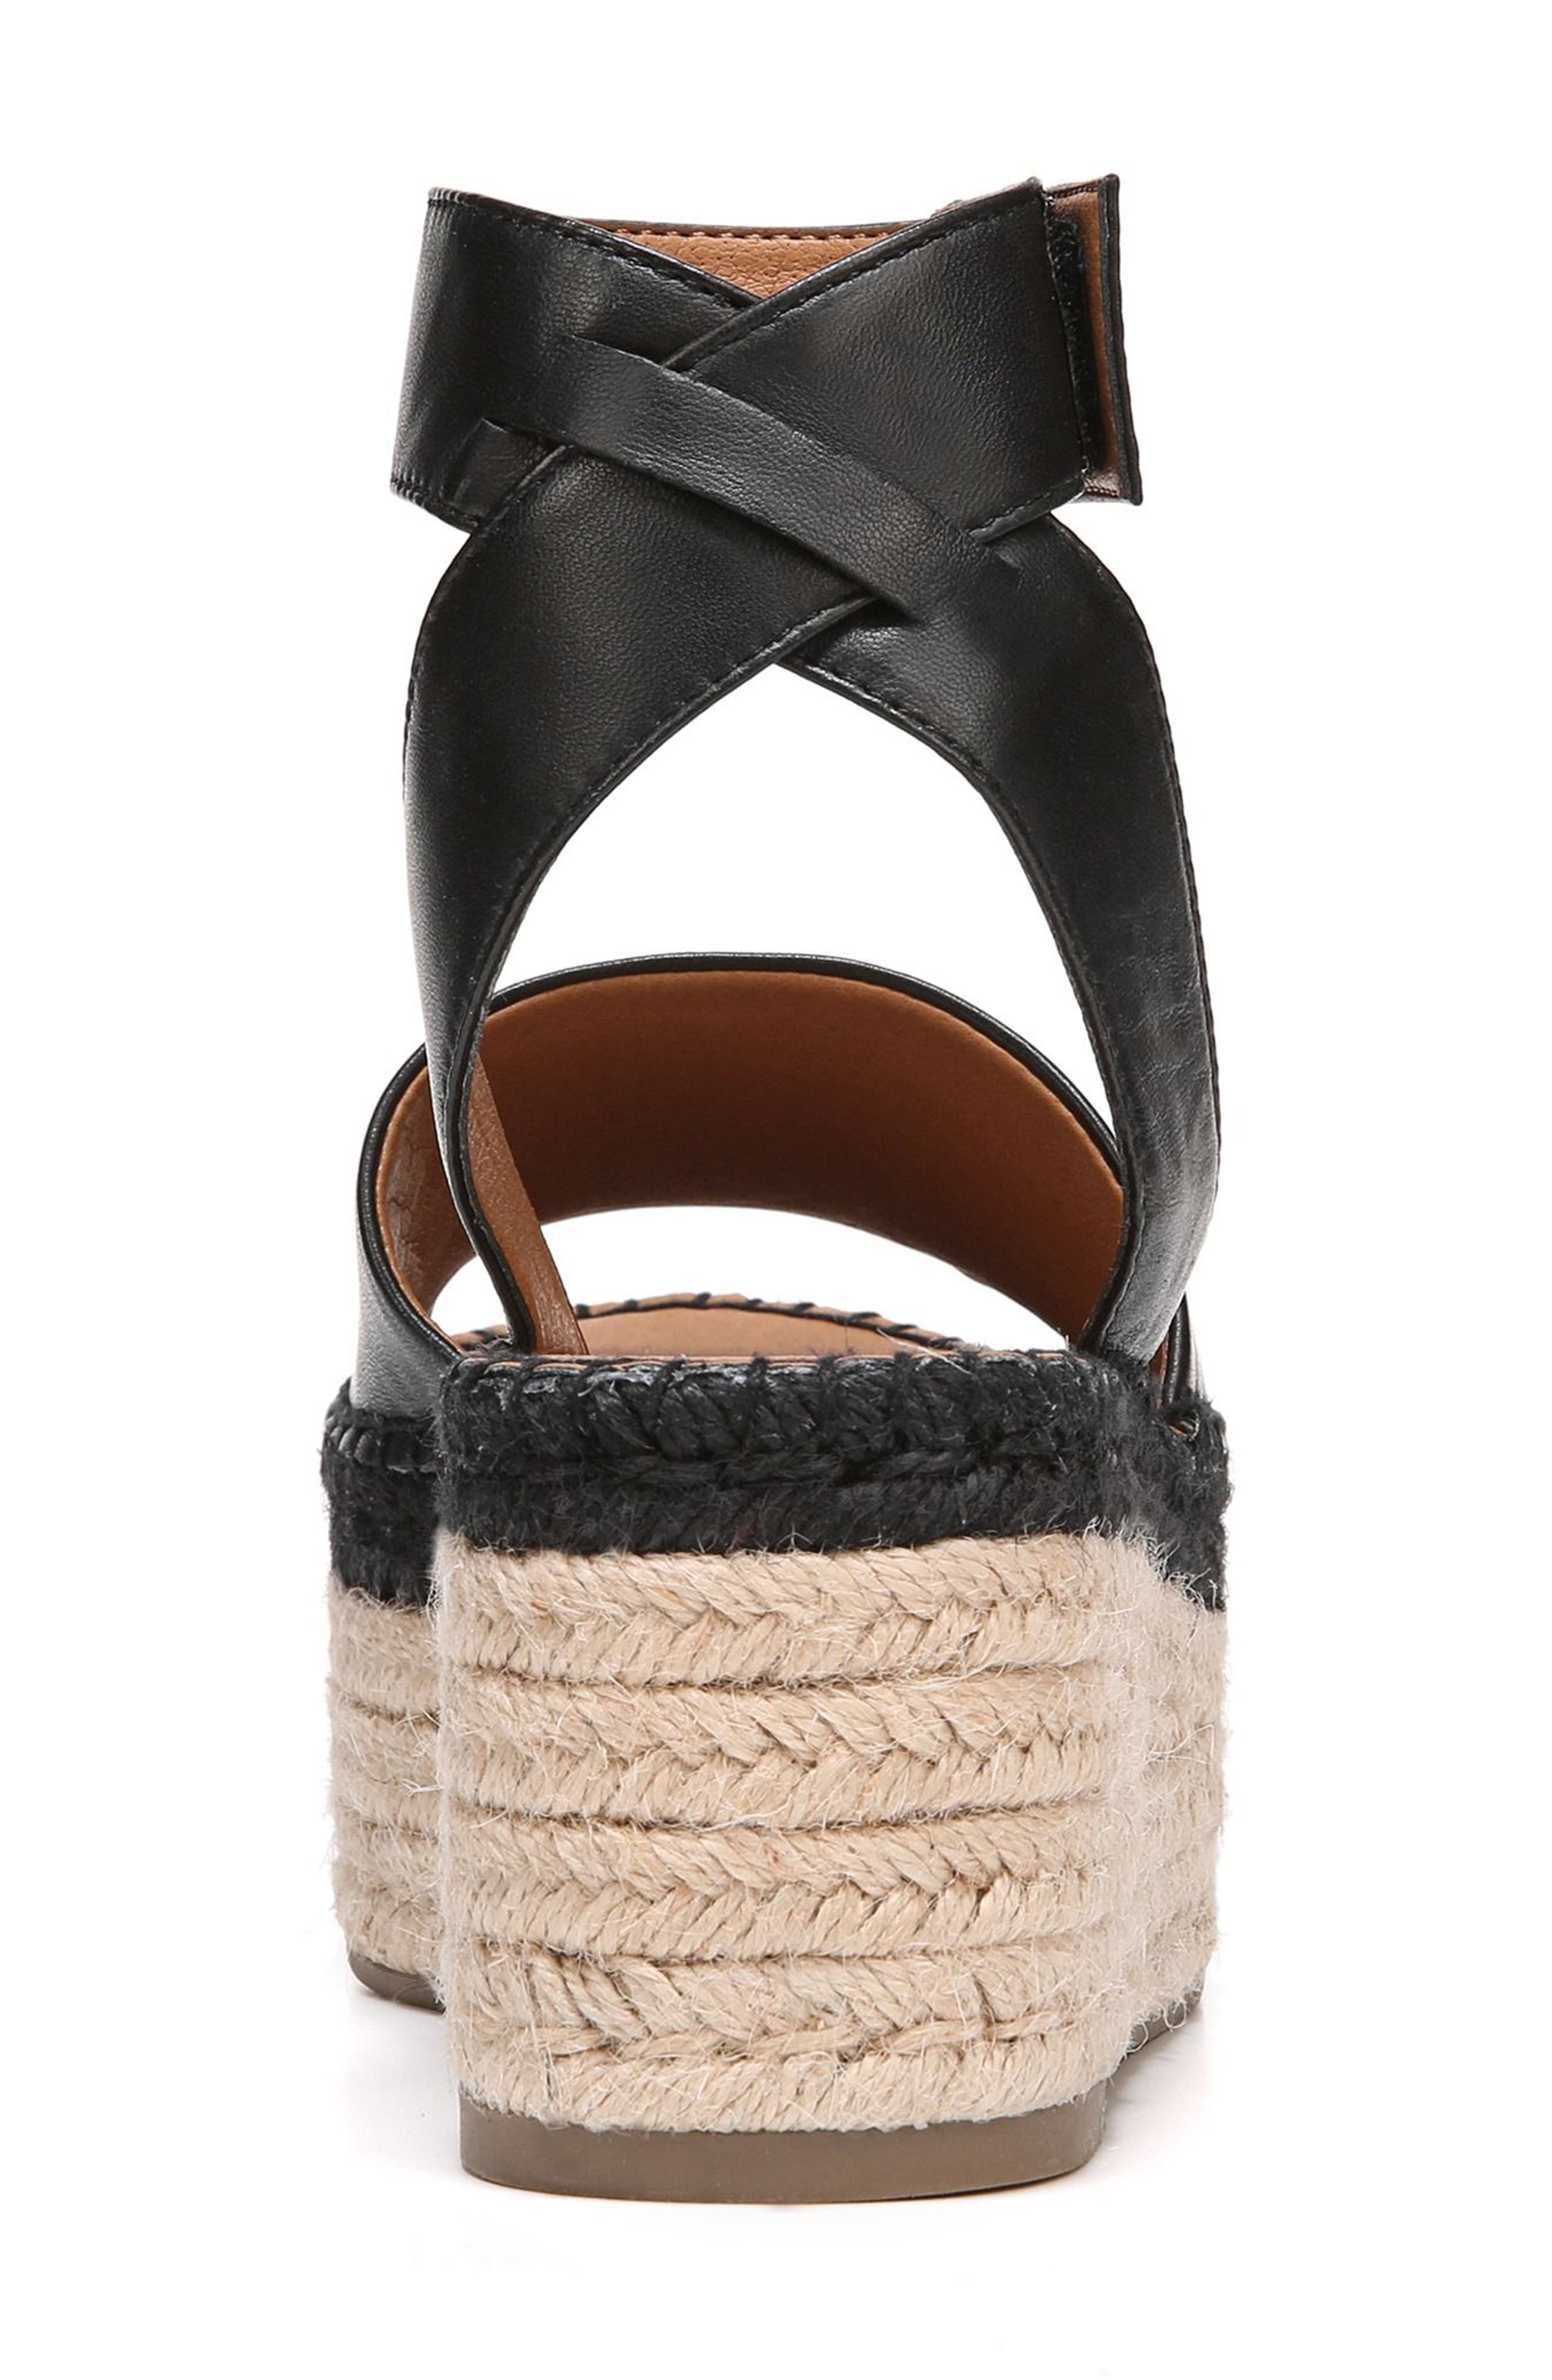 Maisi Platform Espadrille Sandal,                             Alternate thumbnail 2, color,                             BLACK LEATHER